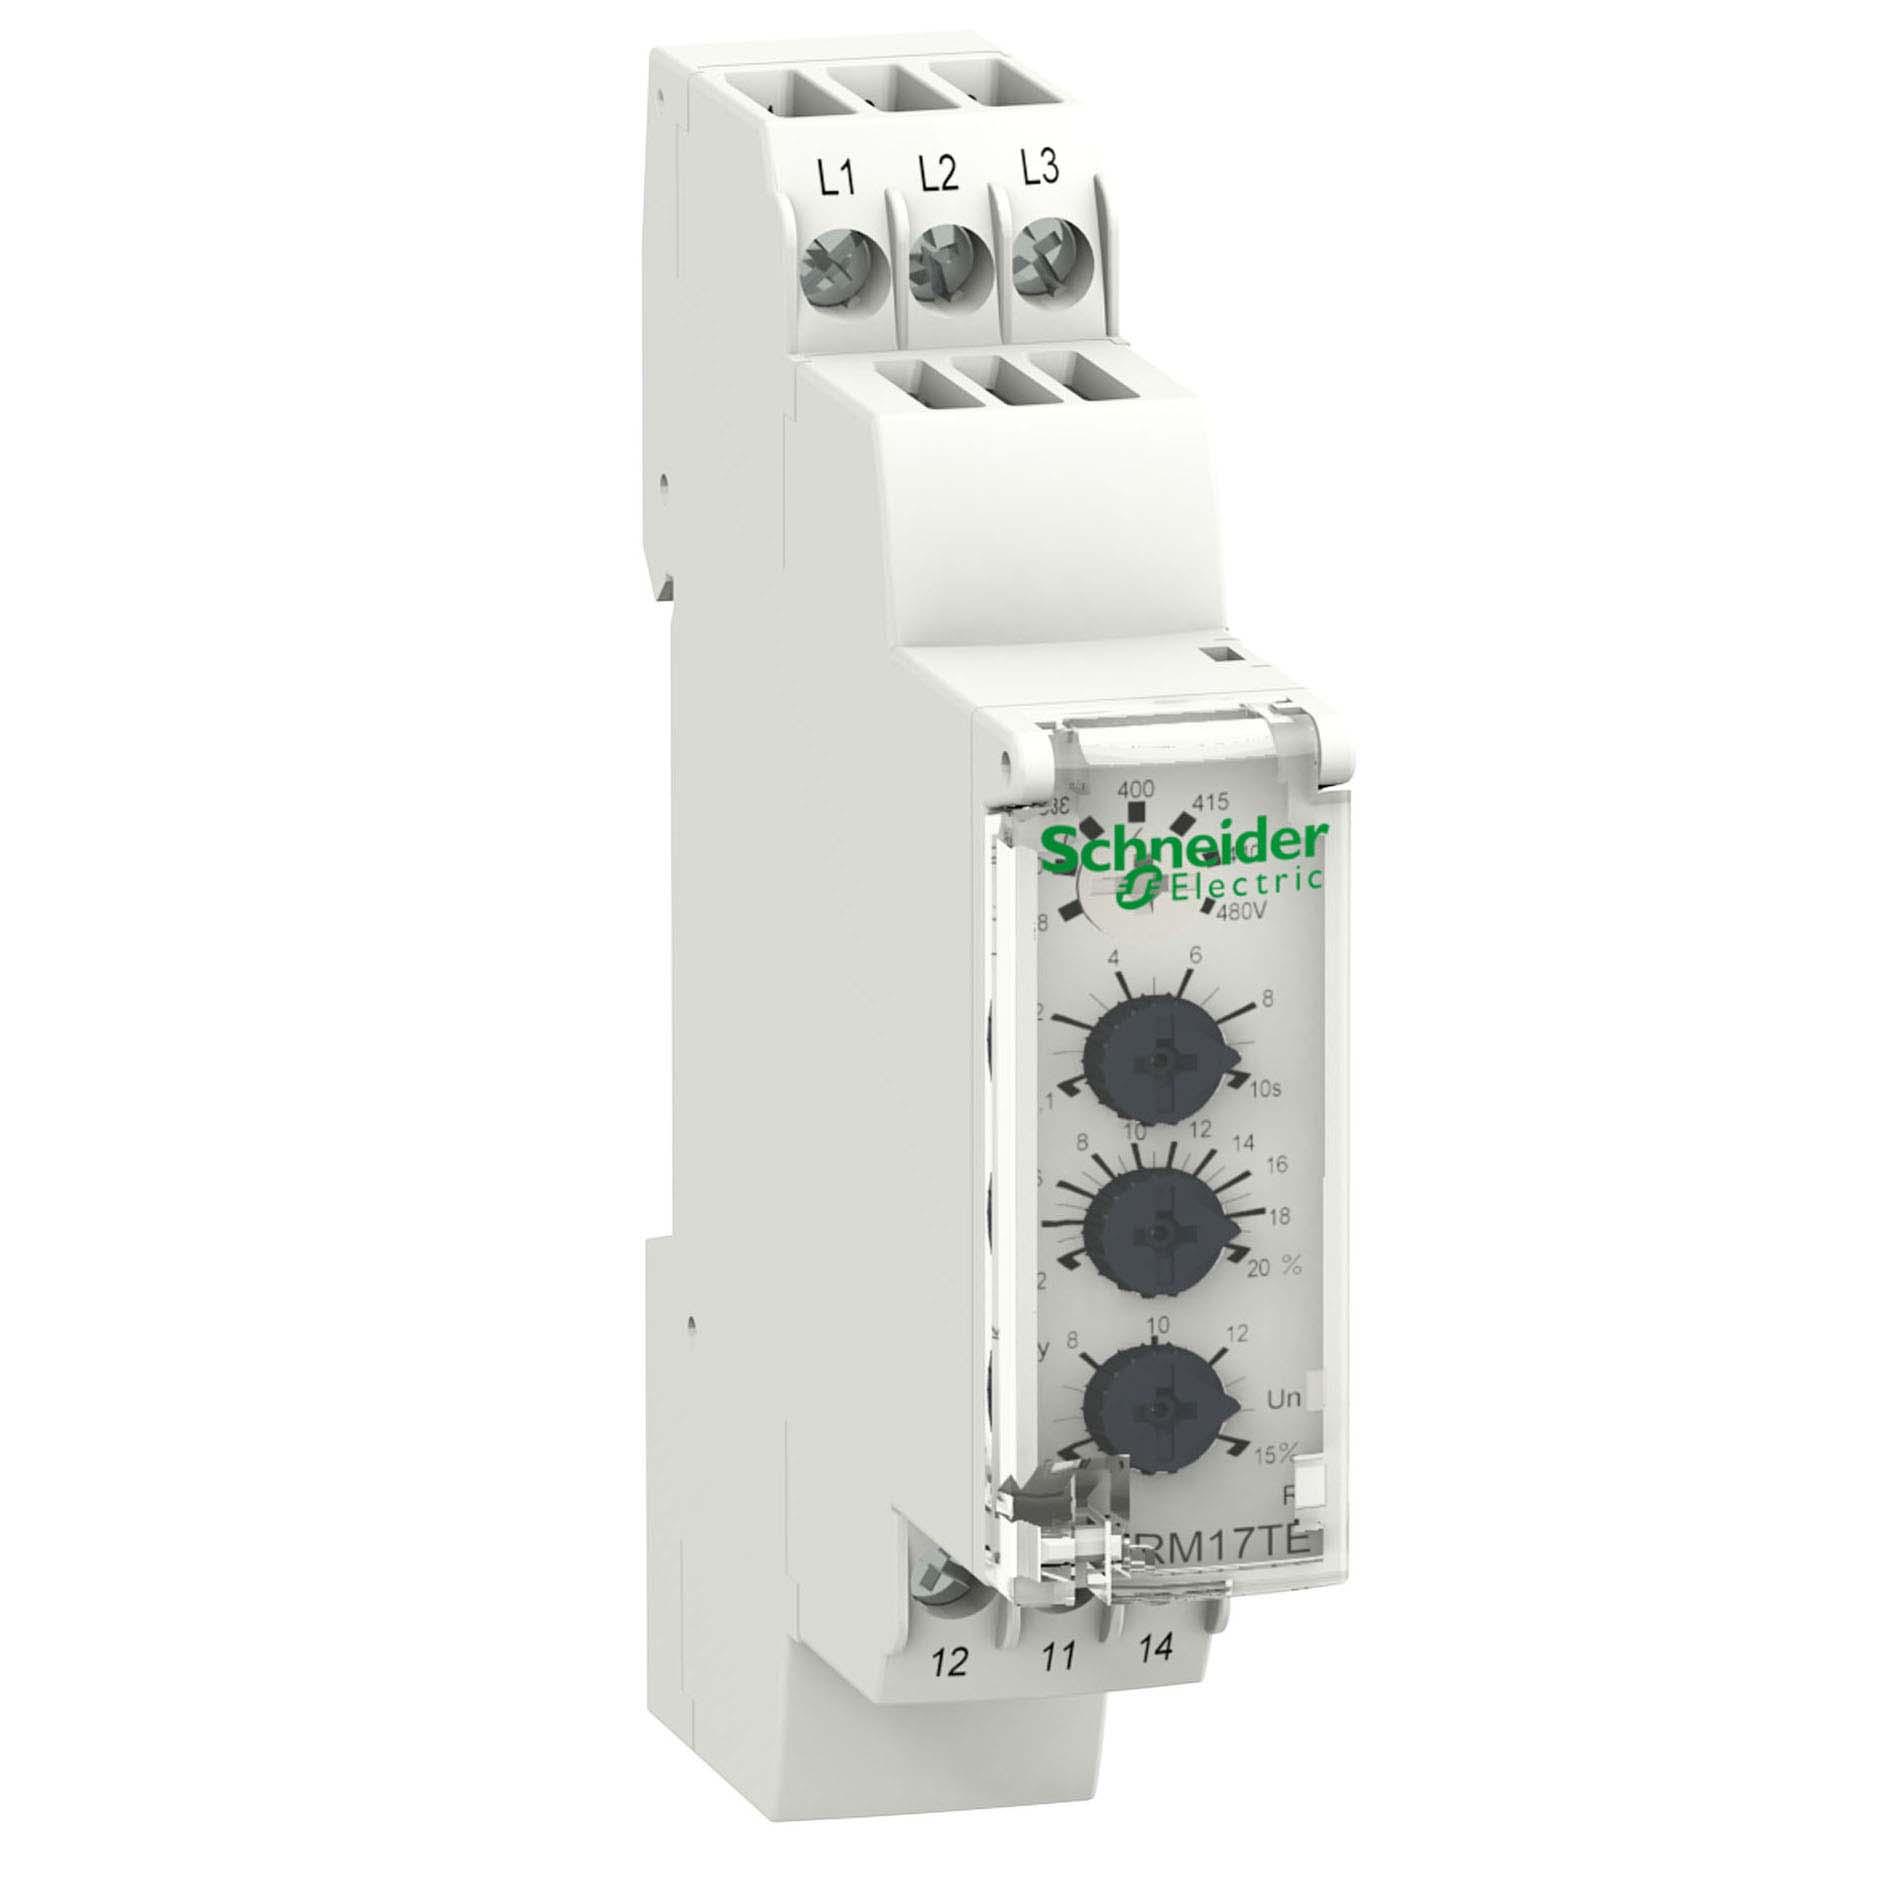 rmte Модульные реле измерения и управления zelio control  zelio control rm17te rm17te00 schneider electric